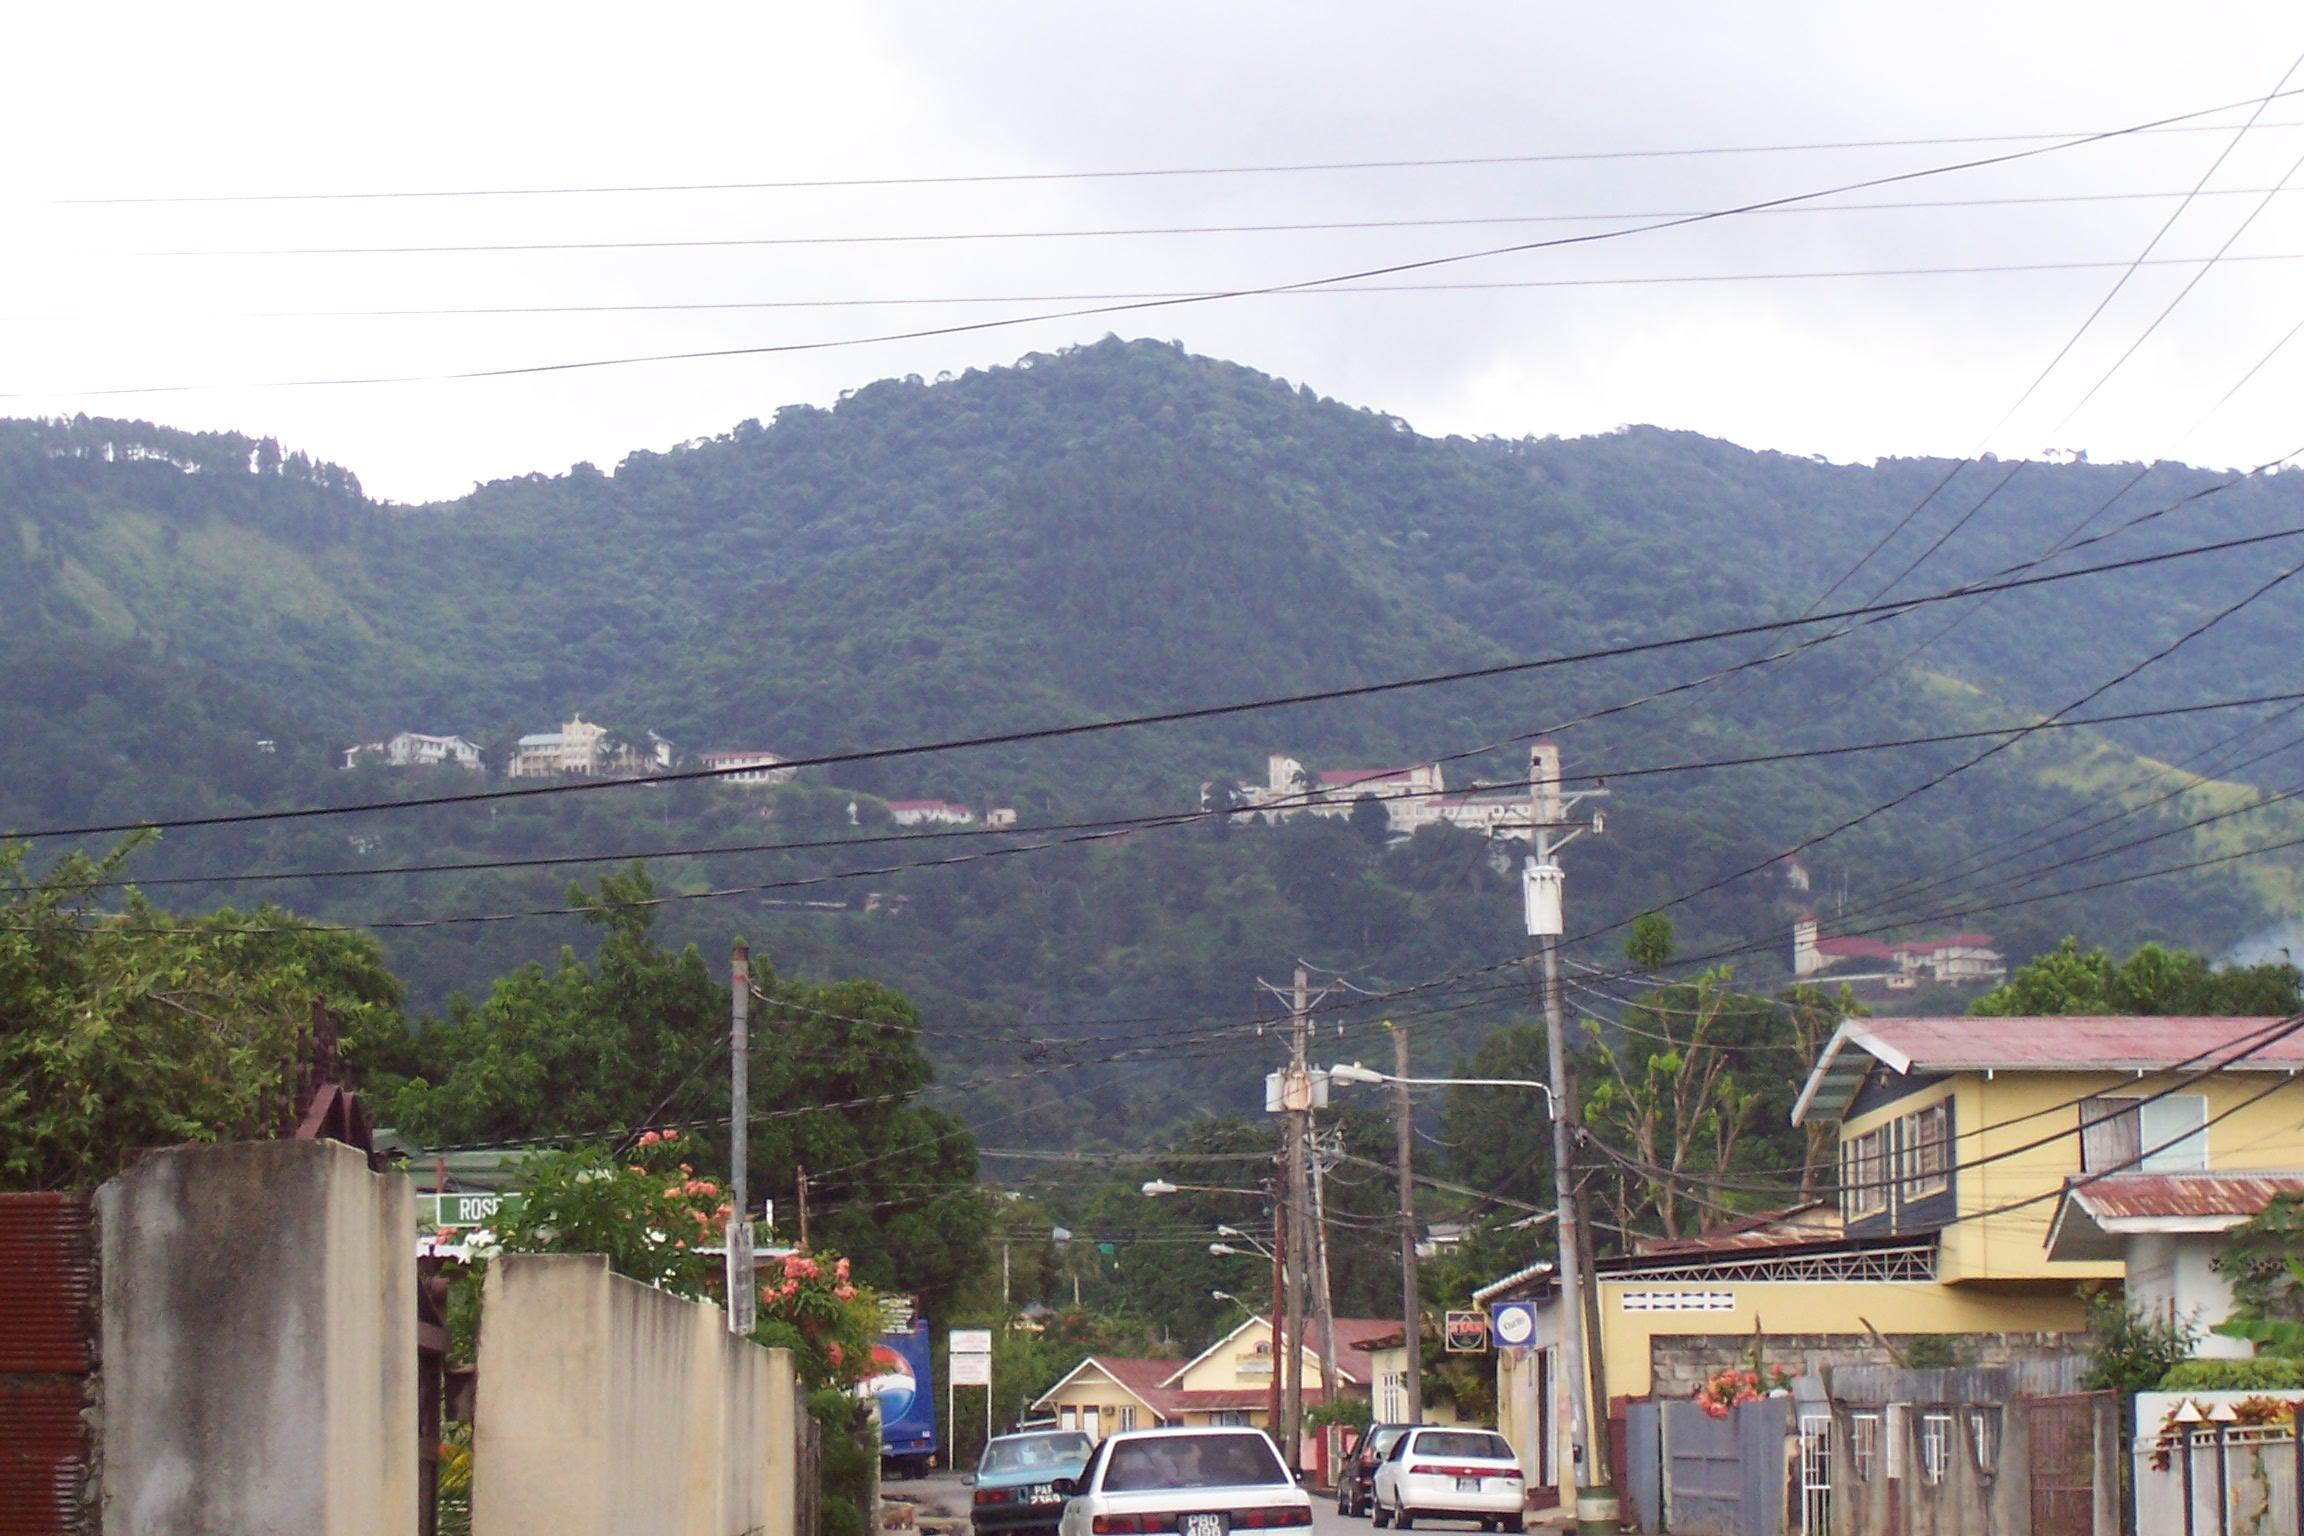 LocationPhotoDirectLink G147388 I27258559 Trinidad Trinidad and Tobago furthermore LocationPhotoDirectLink G147388 I21462698 Trinidad Trinidad and Tobago furthermore 90327192 further ourladyfatimaschoolgurgaon as well City. on guest house in trinidad